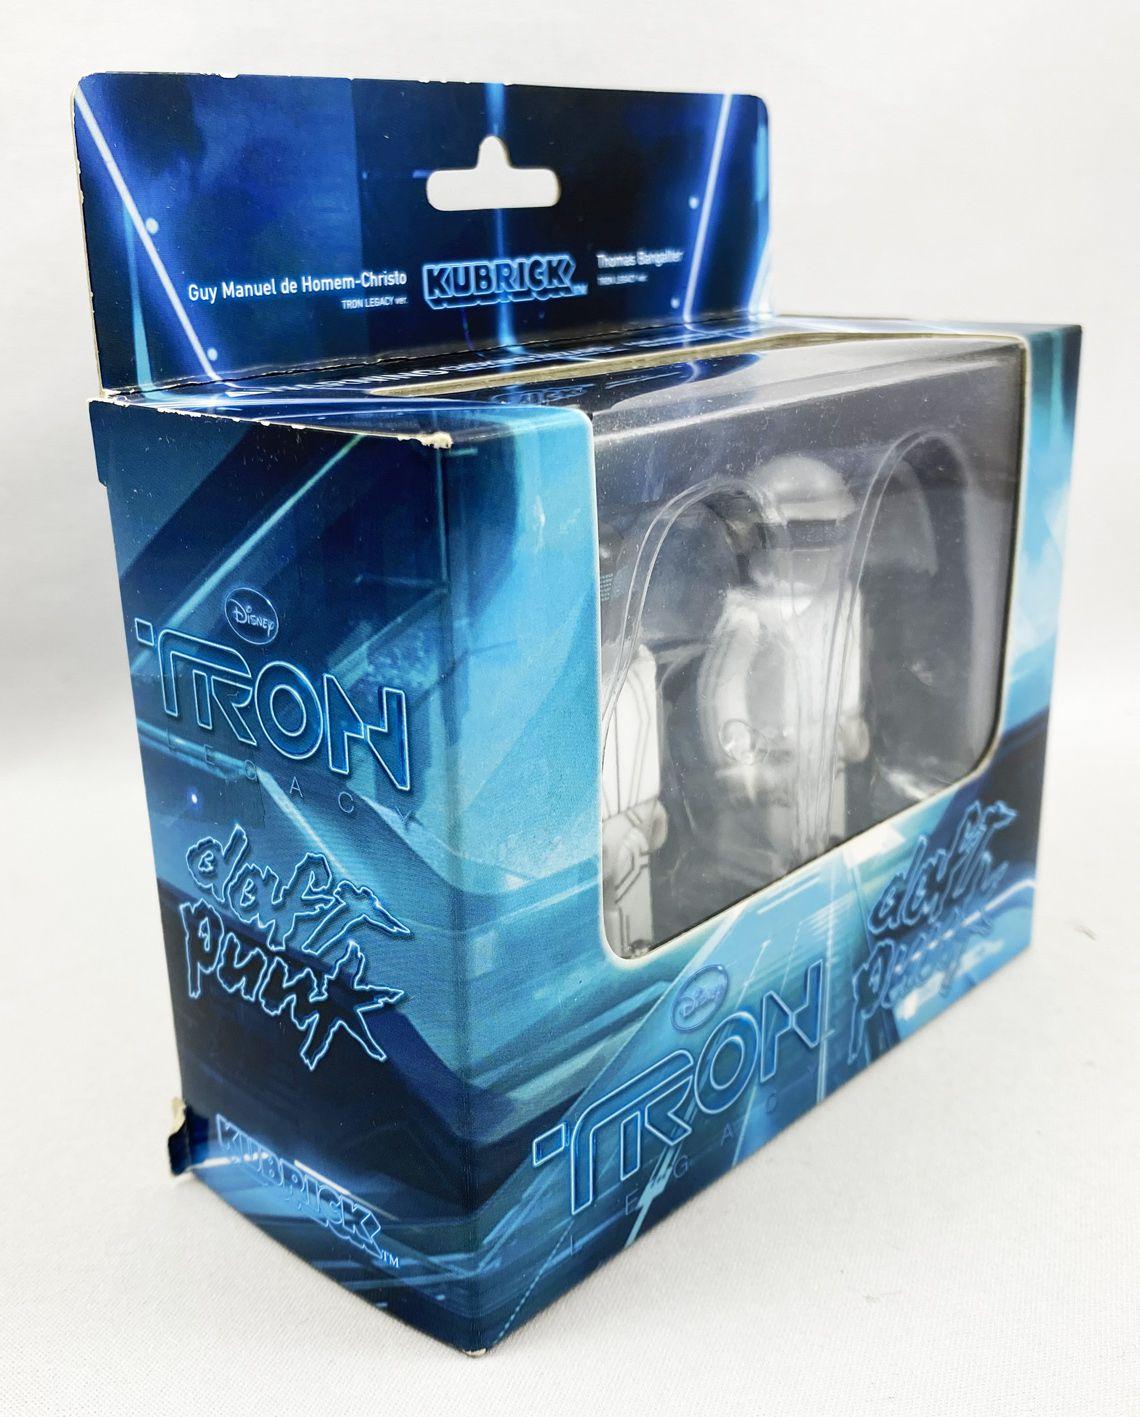 Daft Punk (Tron Legacy) - Medicom Toys Kubrick